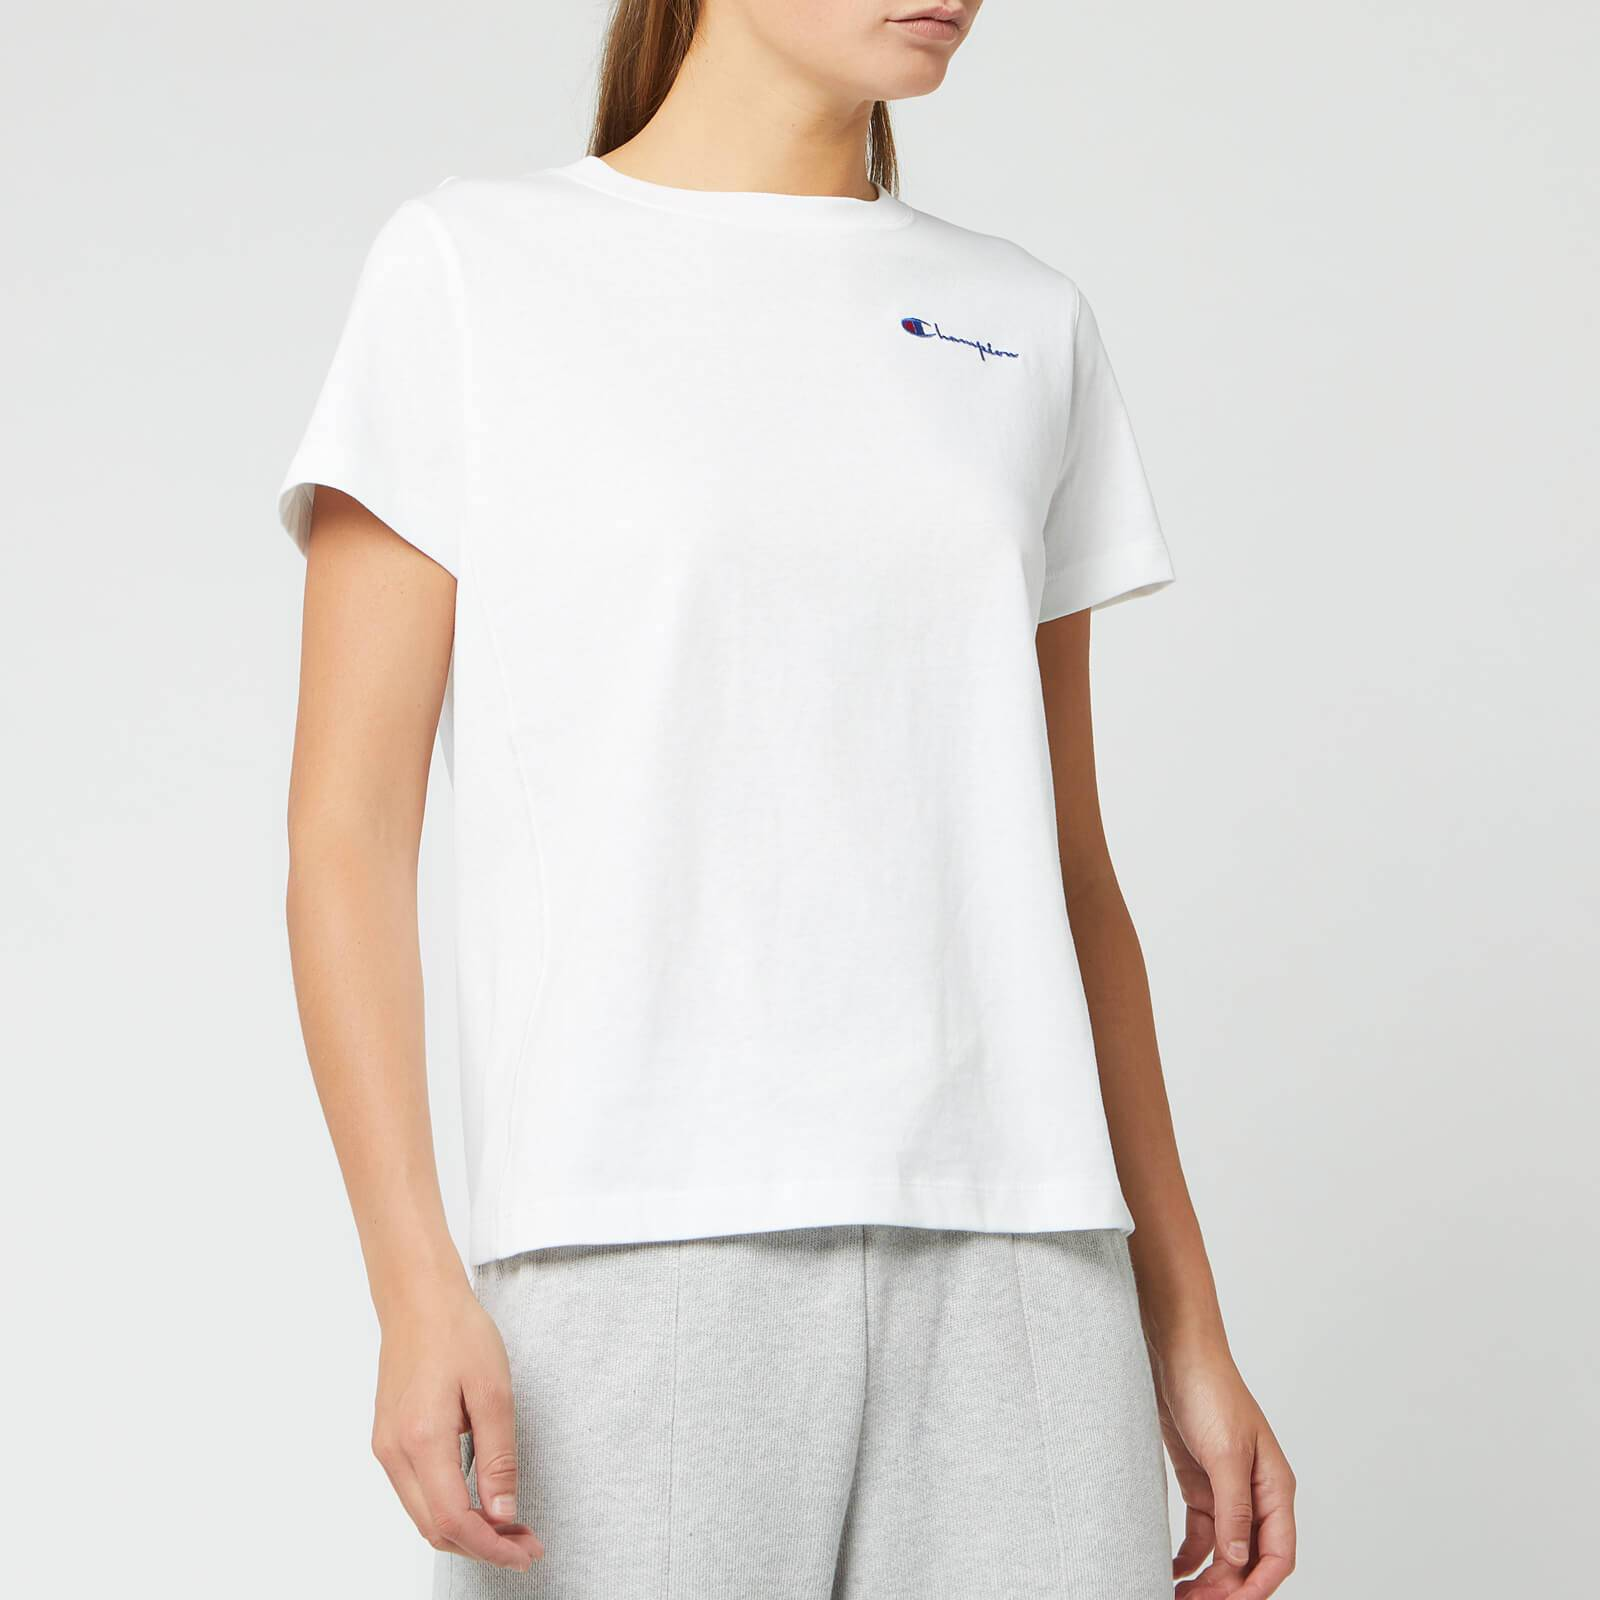 Champion Women's Small Script Crew Neck Short Sleeve T-Shirt - White - L